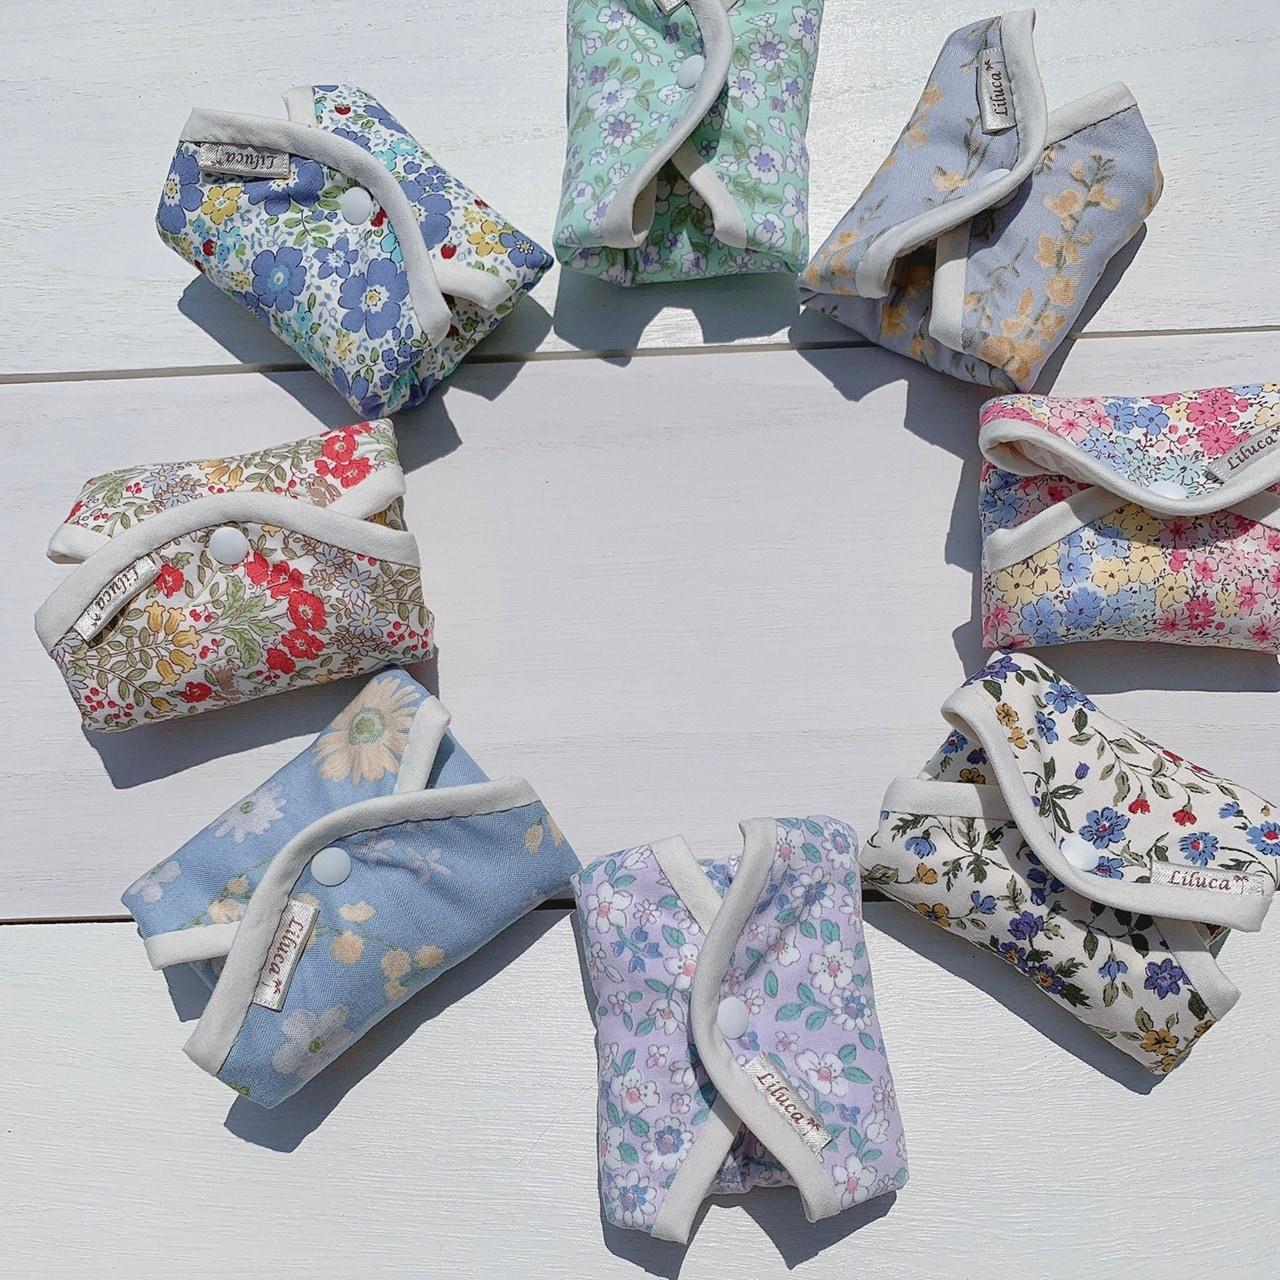 Liluca(リルカ)オリジナル 布ナプキン 愛知県田原市 大場啓世 生理用品 冷え性対策